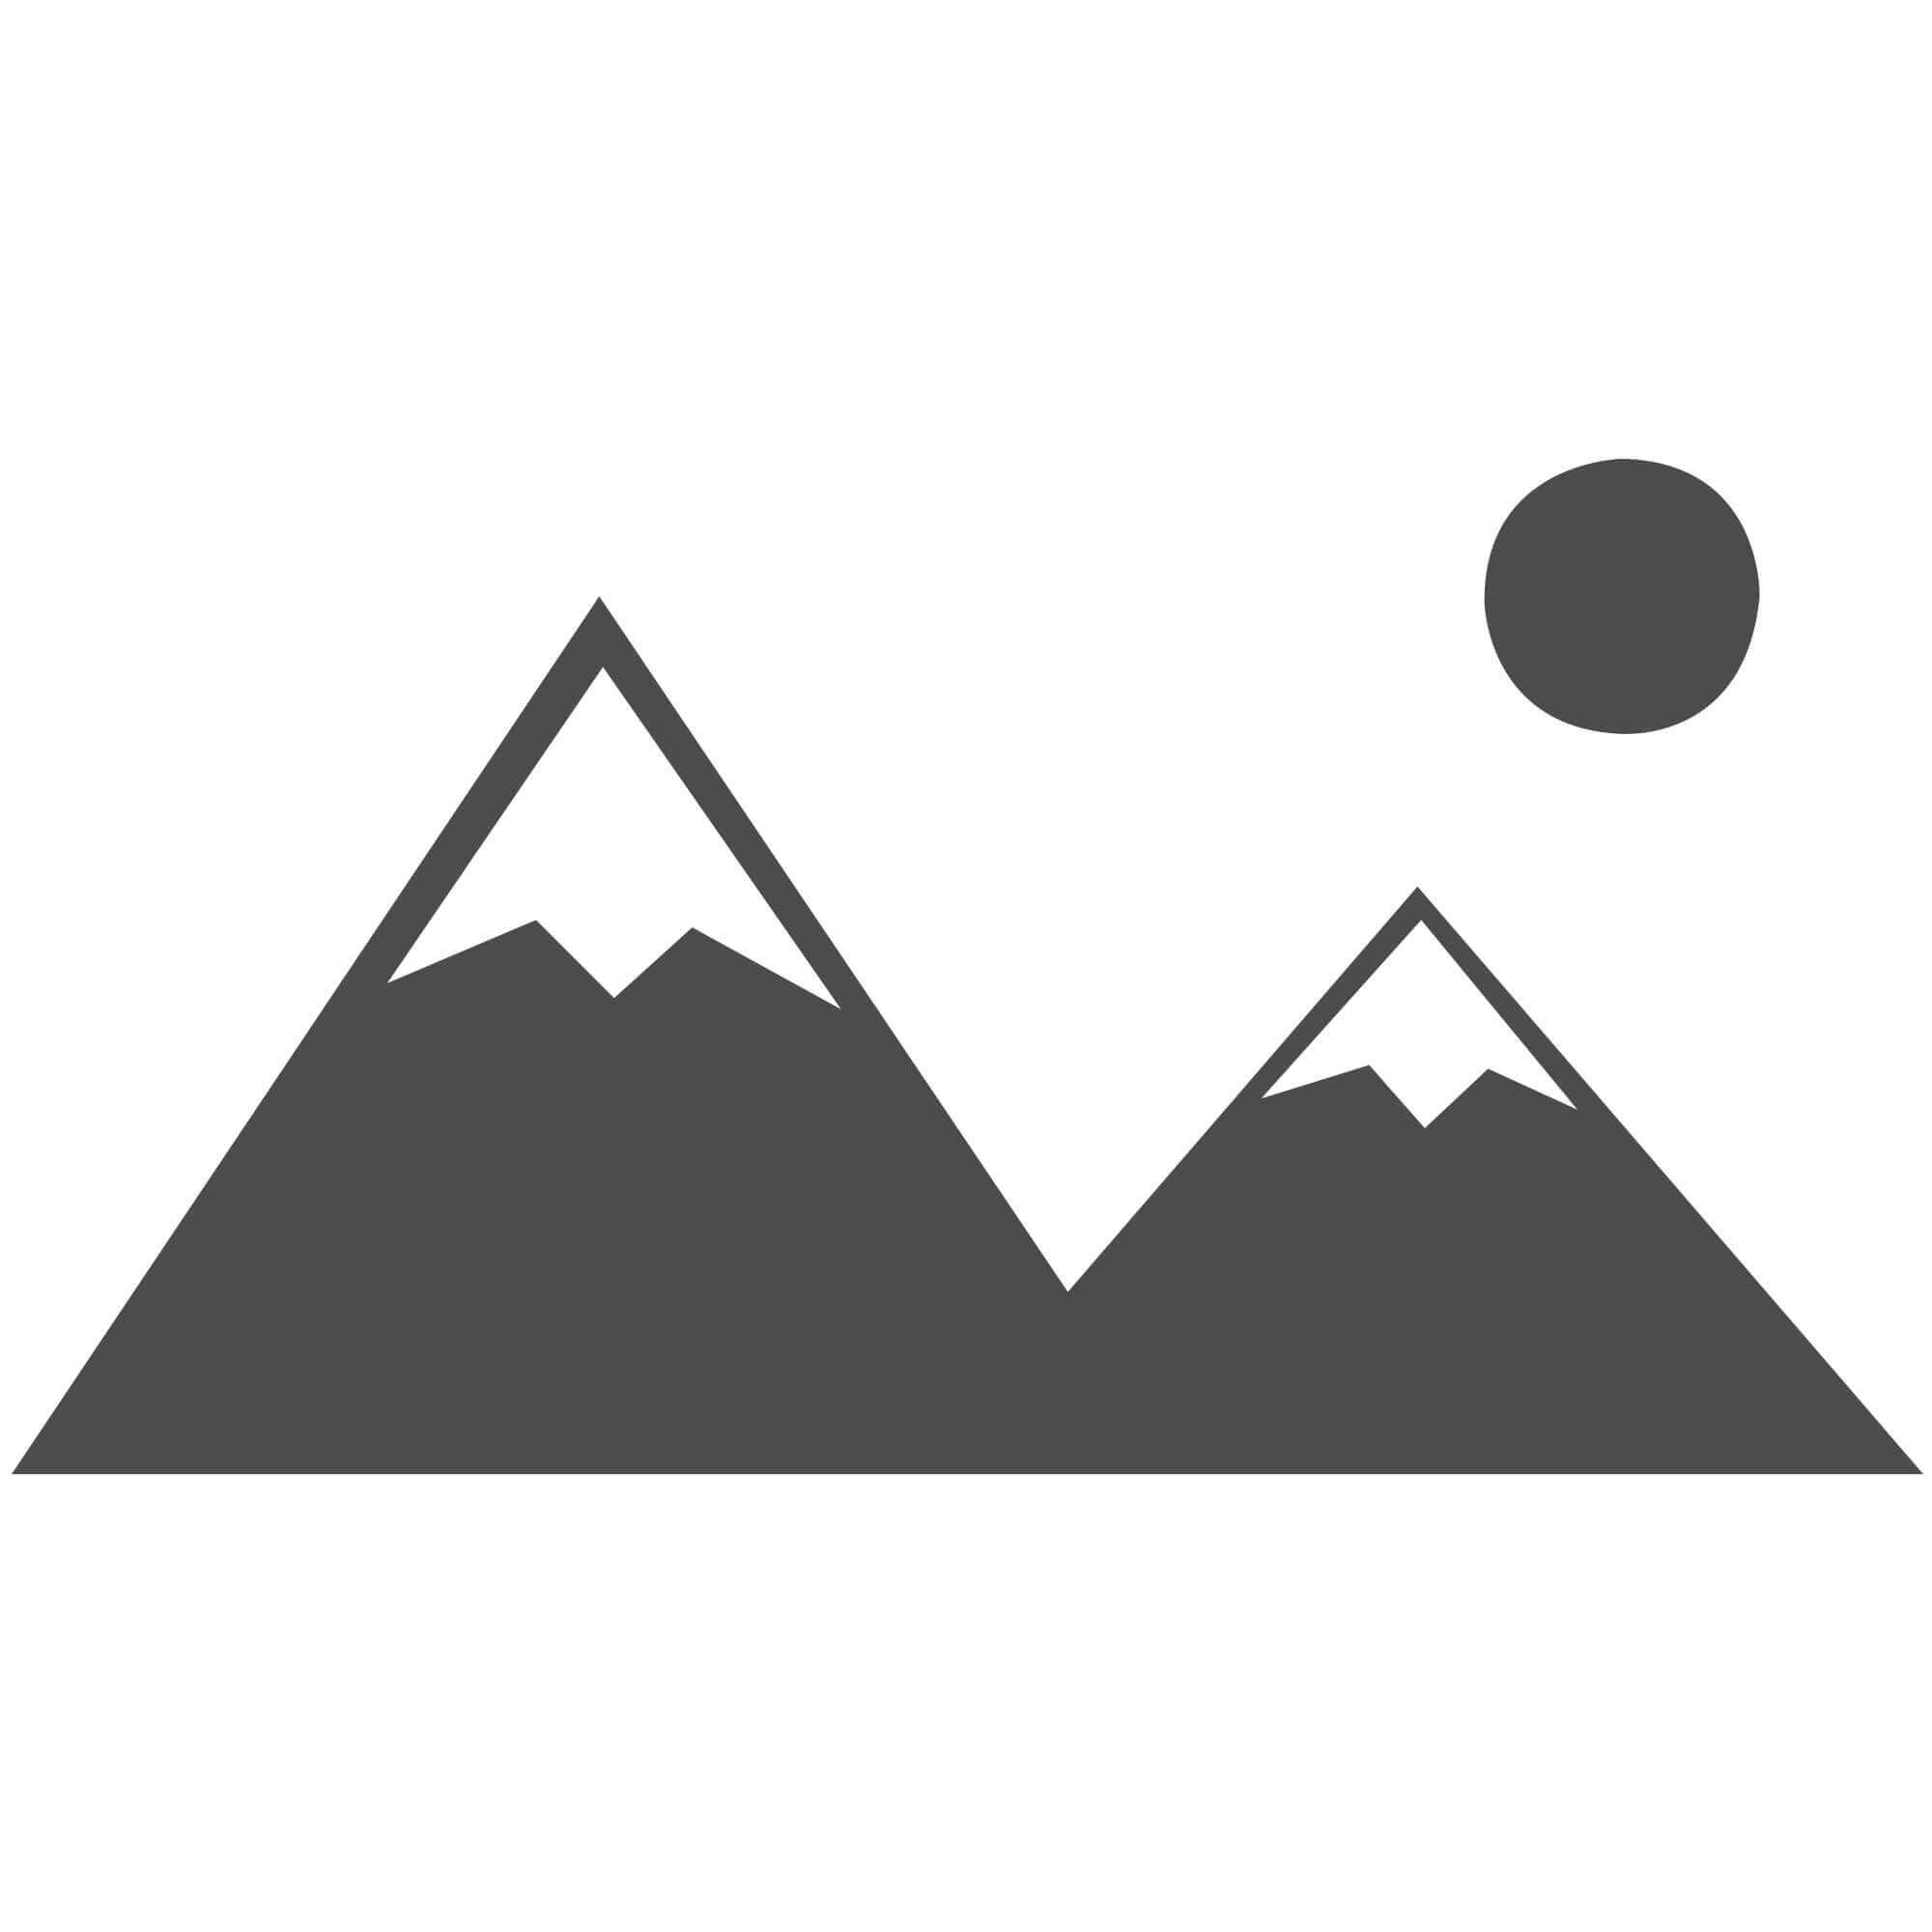 "Cascade Shaggy Rug - Smoke Brown - Size 65 x 135 cm (2'2"" x 4'5"")"